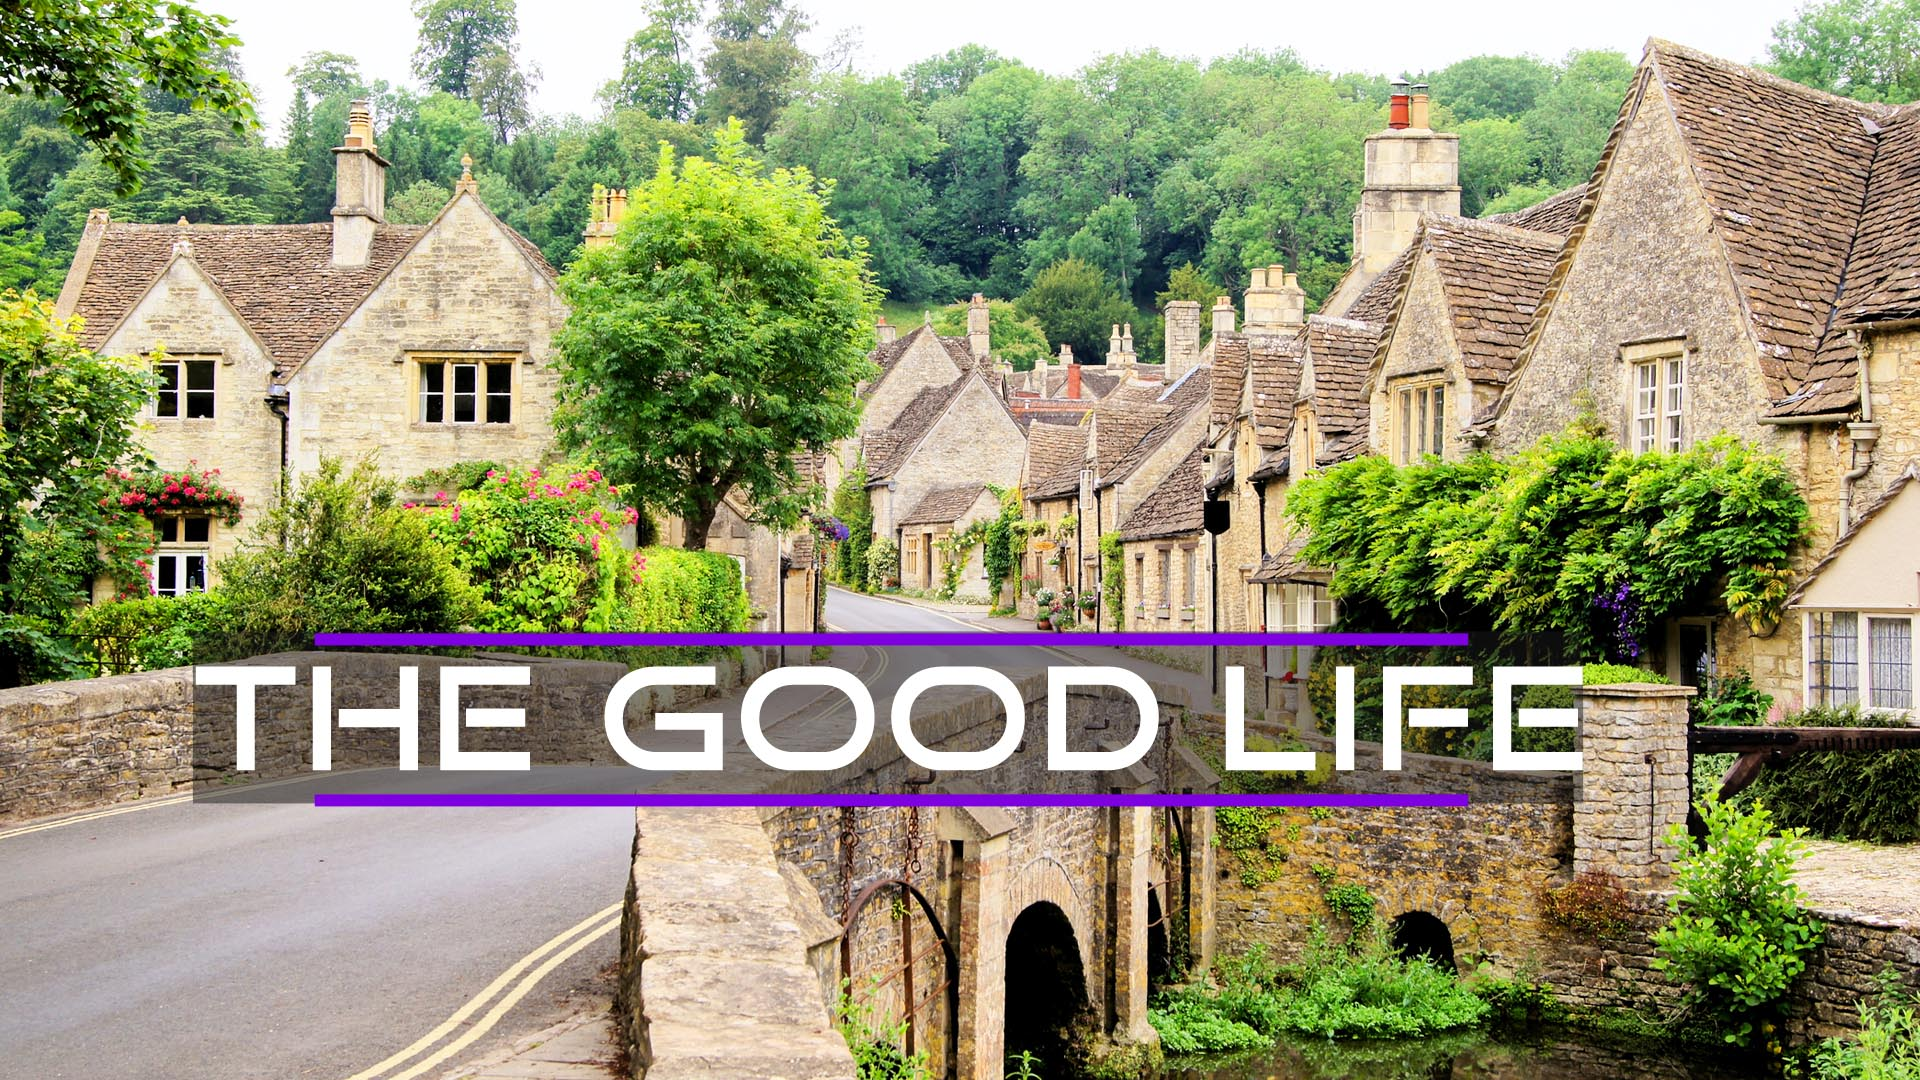 The Good Life -